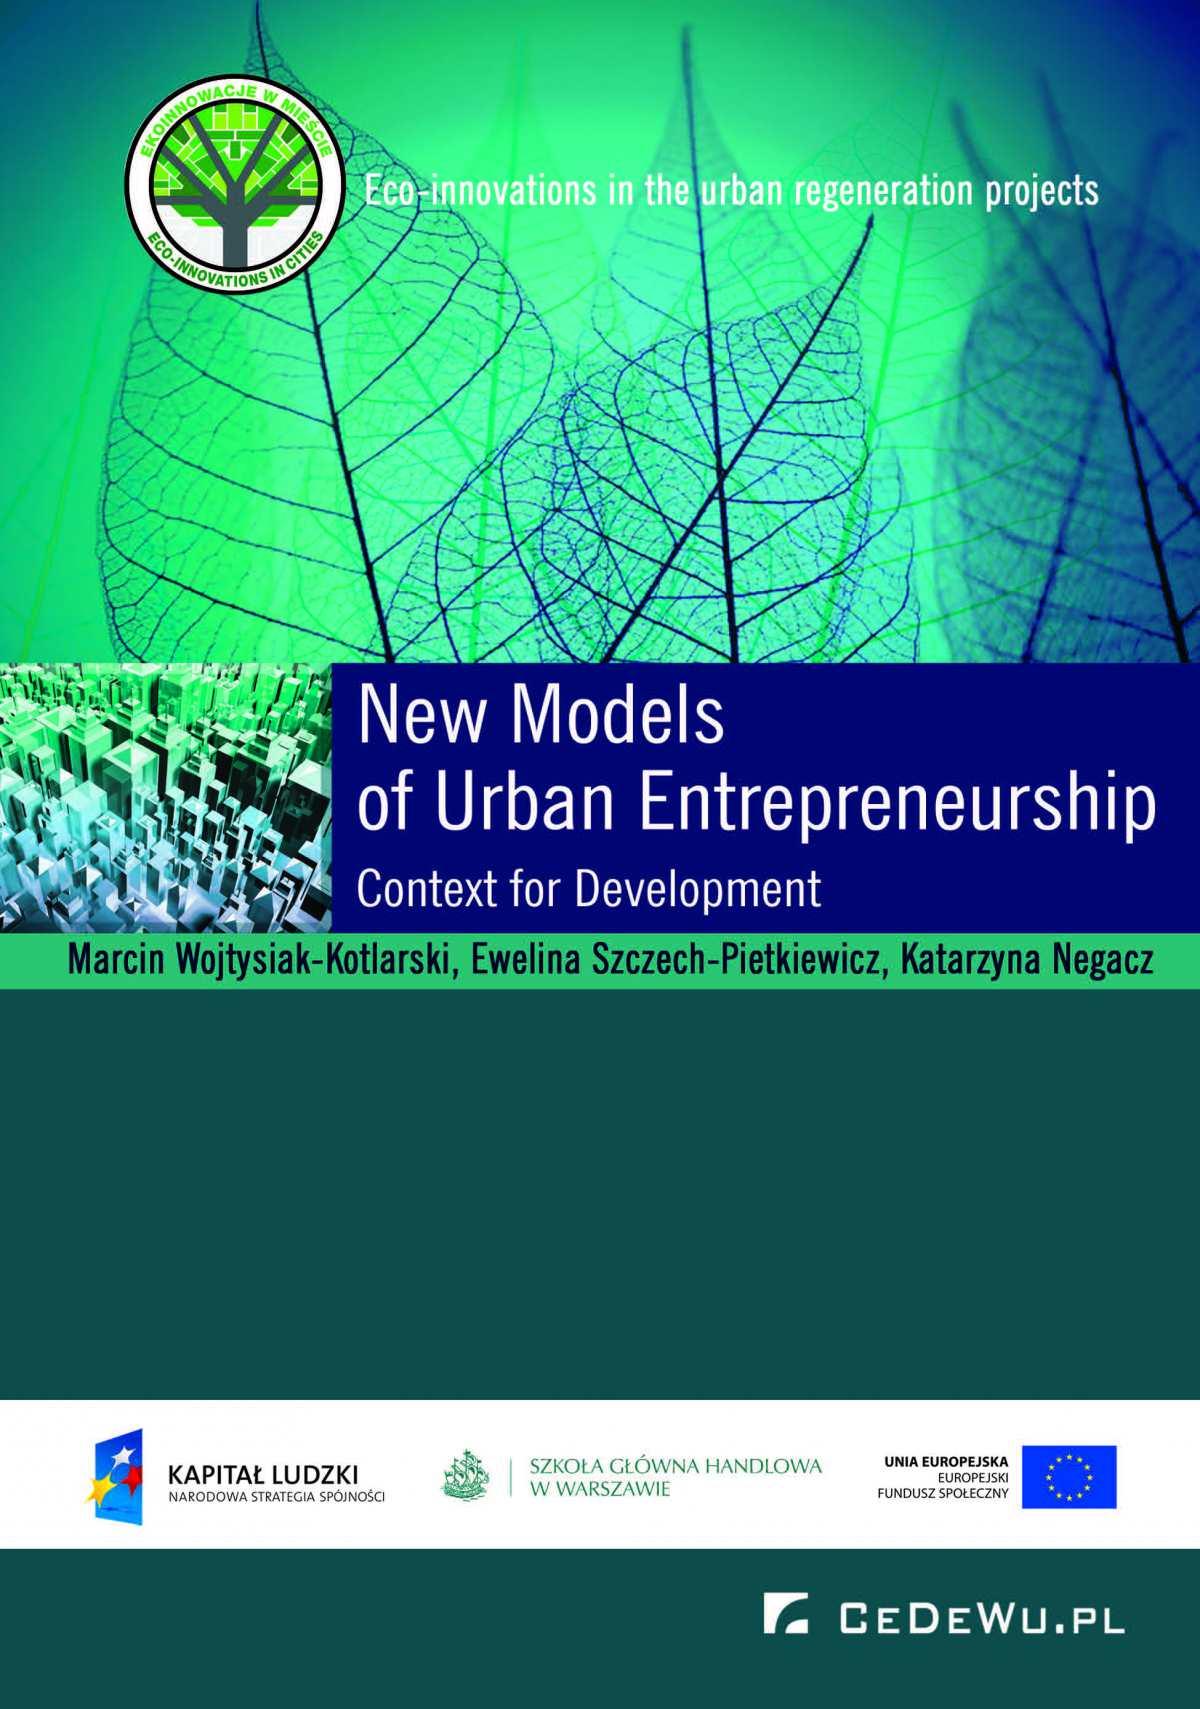 New Models of Urban Entrepreneurship. Context for Development - Ebook (Książka PDF) do pobrania w formacie PDF